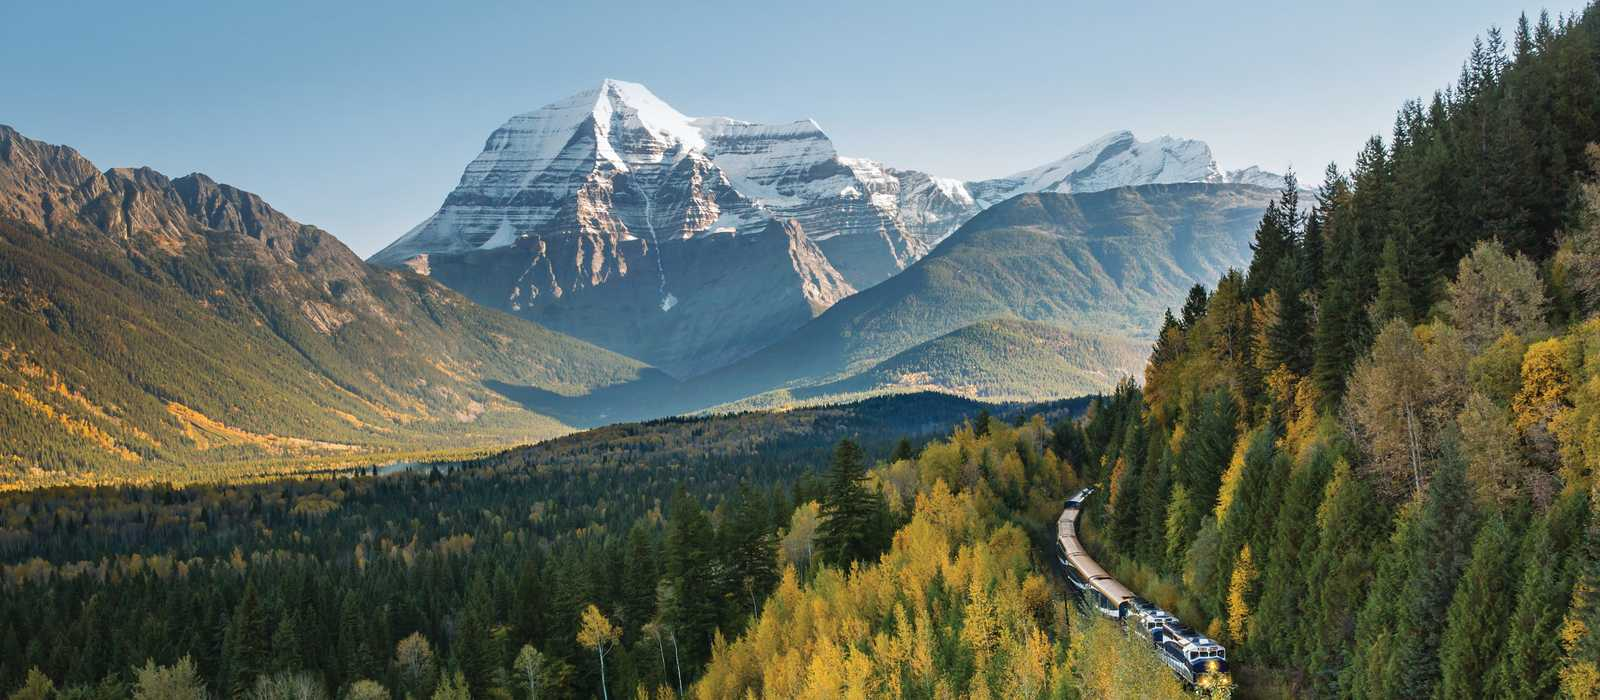 Zug der Rocky Mountaineer Bahngesellschaft vor dem Mount Robson